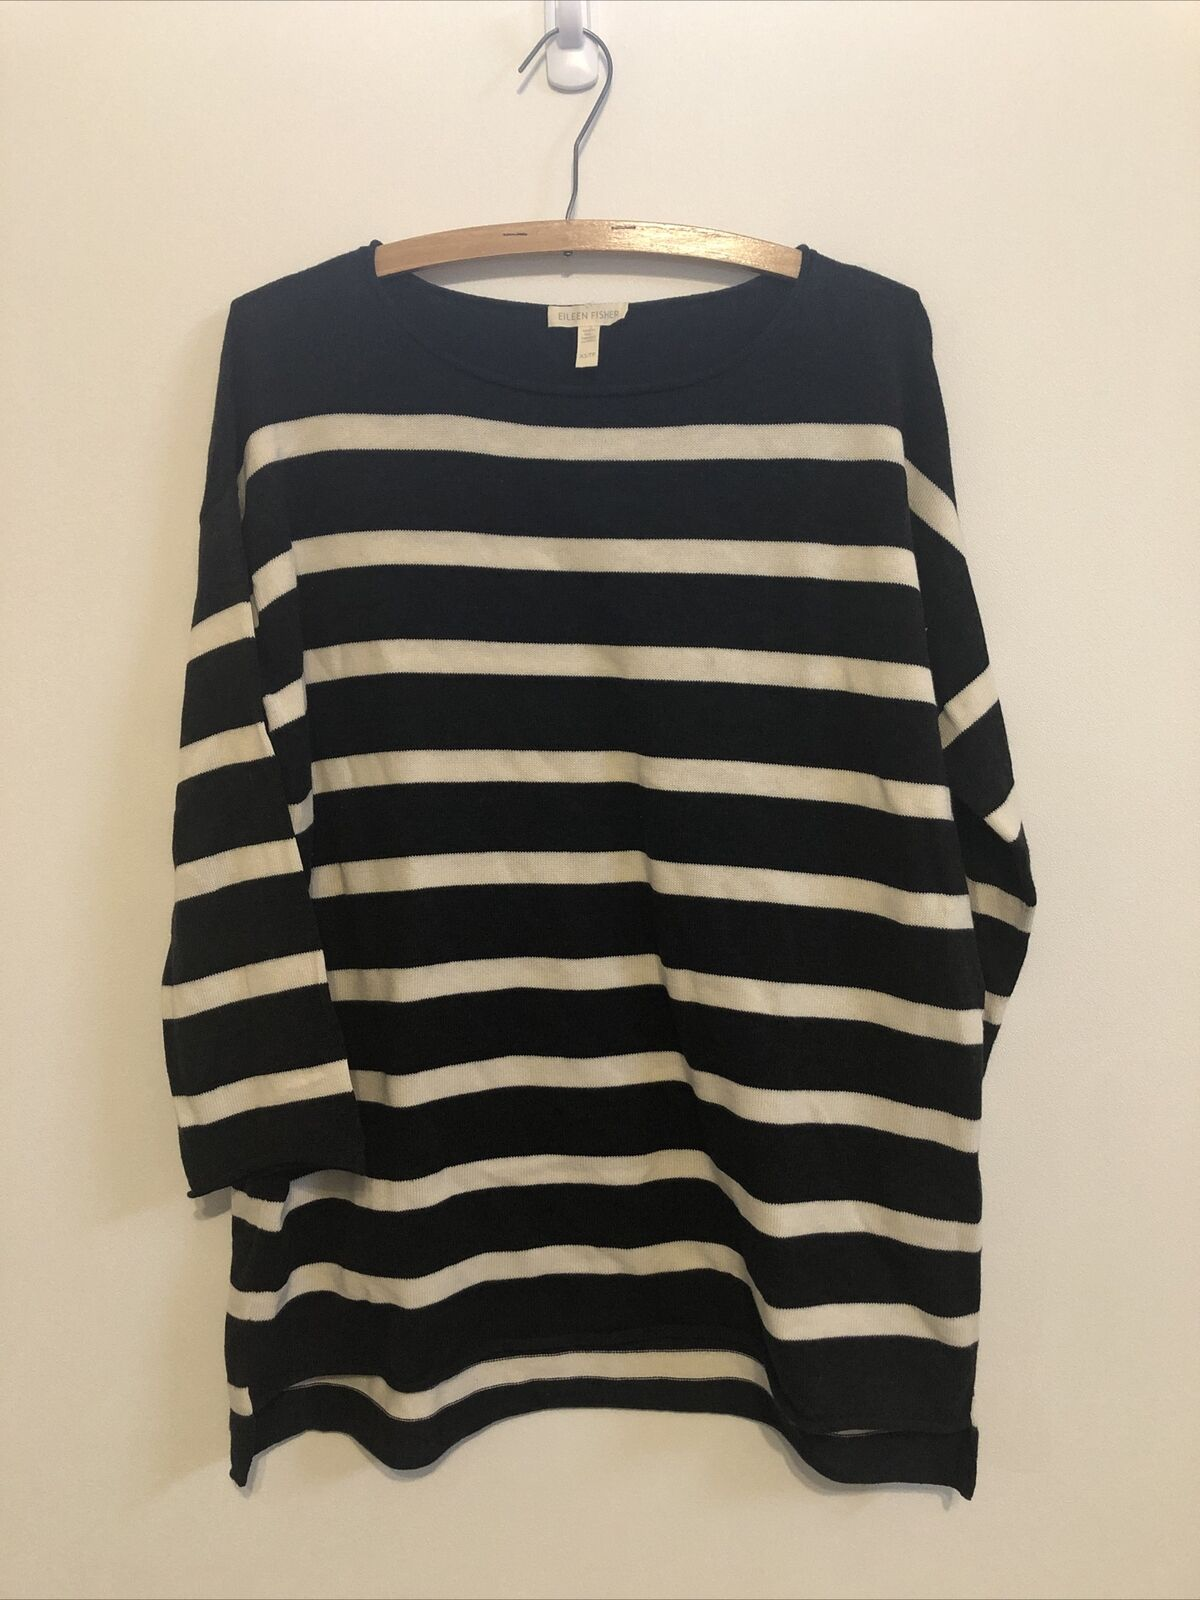 Eileen Fisher Womens Gray Cotton Striped Shirt Pullover Sweater Top XL BHFO 4764